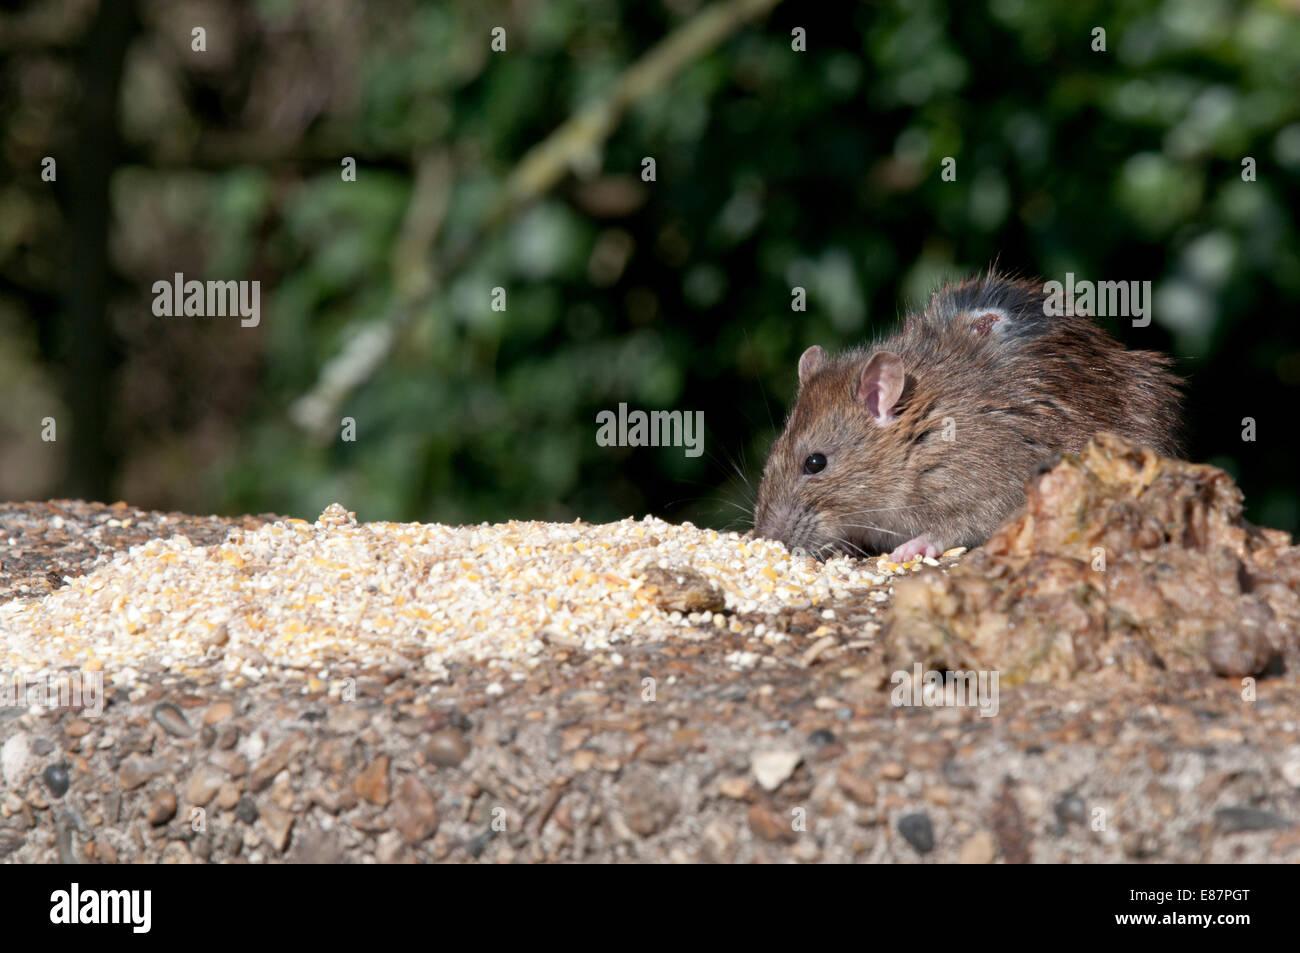 Brown Rat feeding on seed left for birds at Cadmore Lane Bridge, Cheshunt, Herts - Stock Image